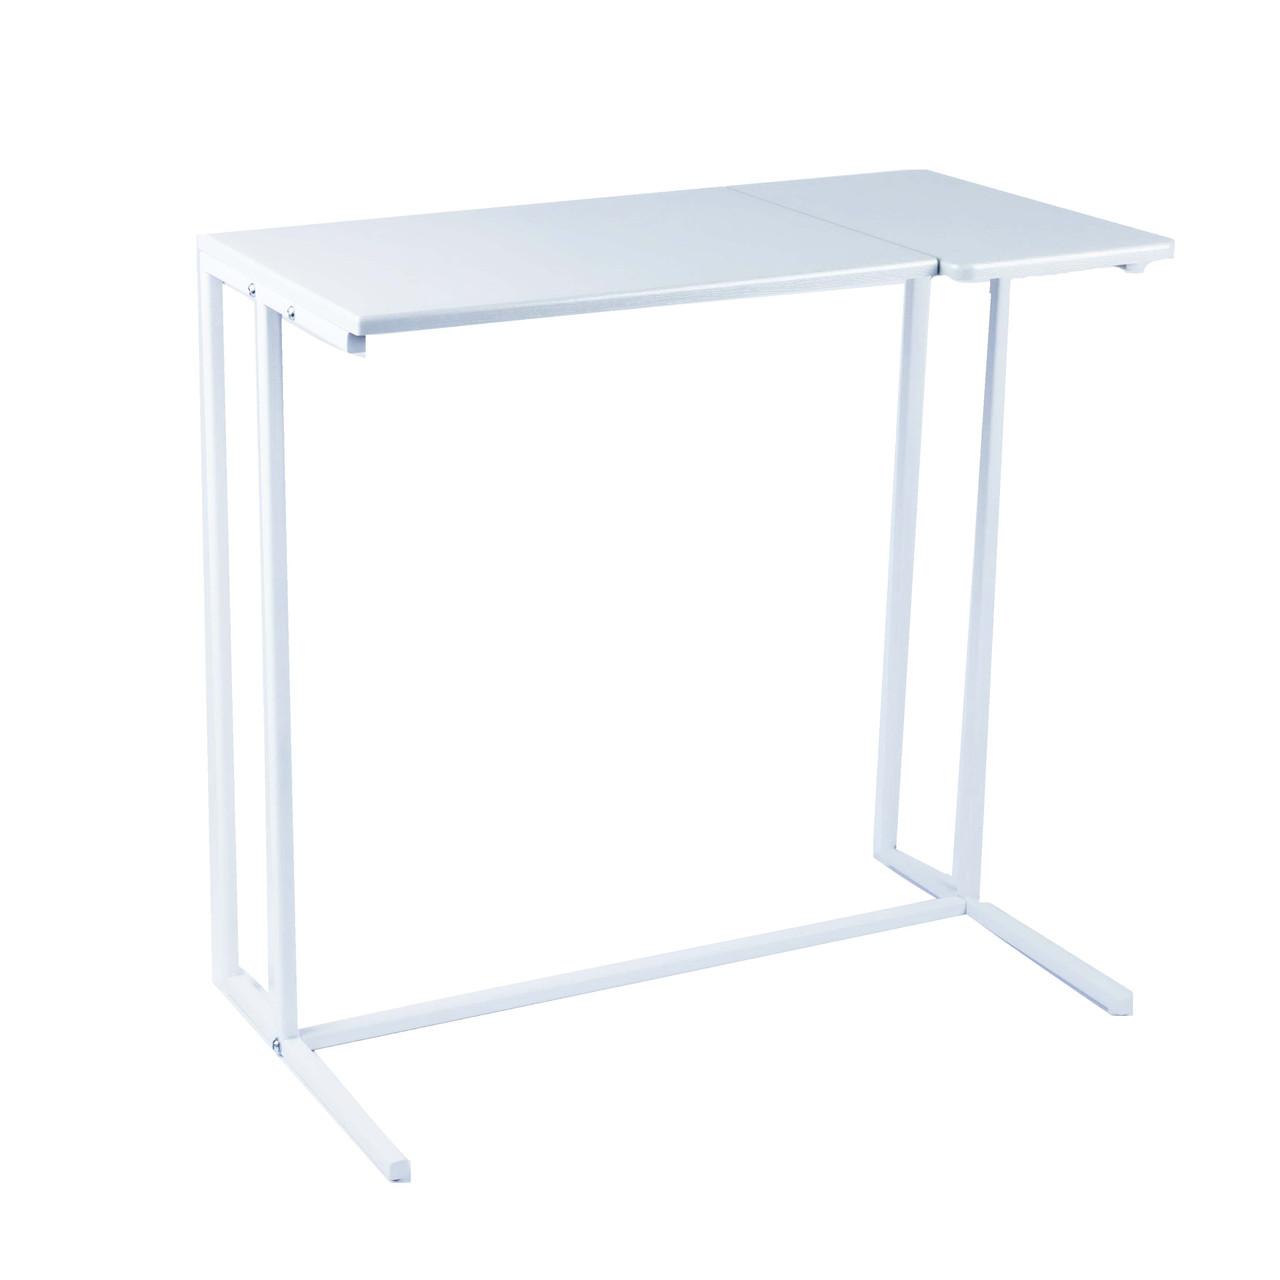 Стол приставной для предметов комфорта и IT-техники Commus Comfort A600 white/white/white